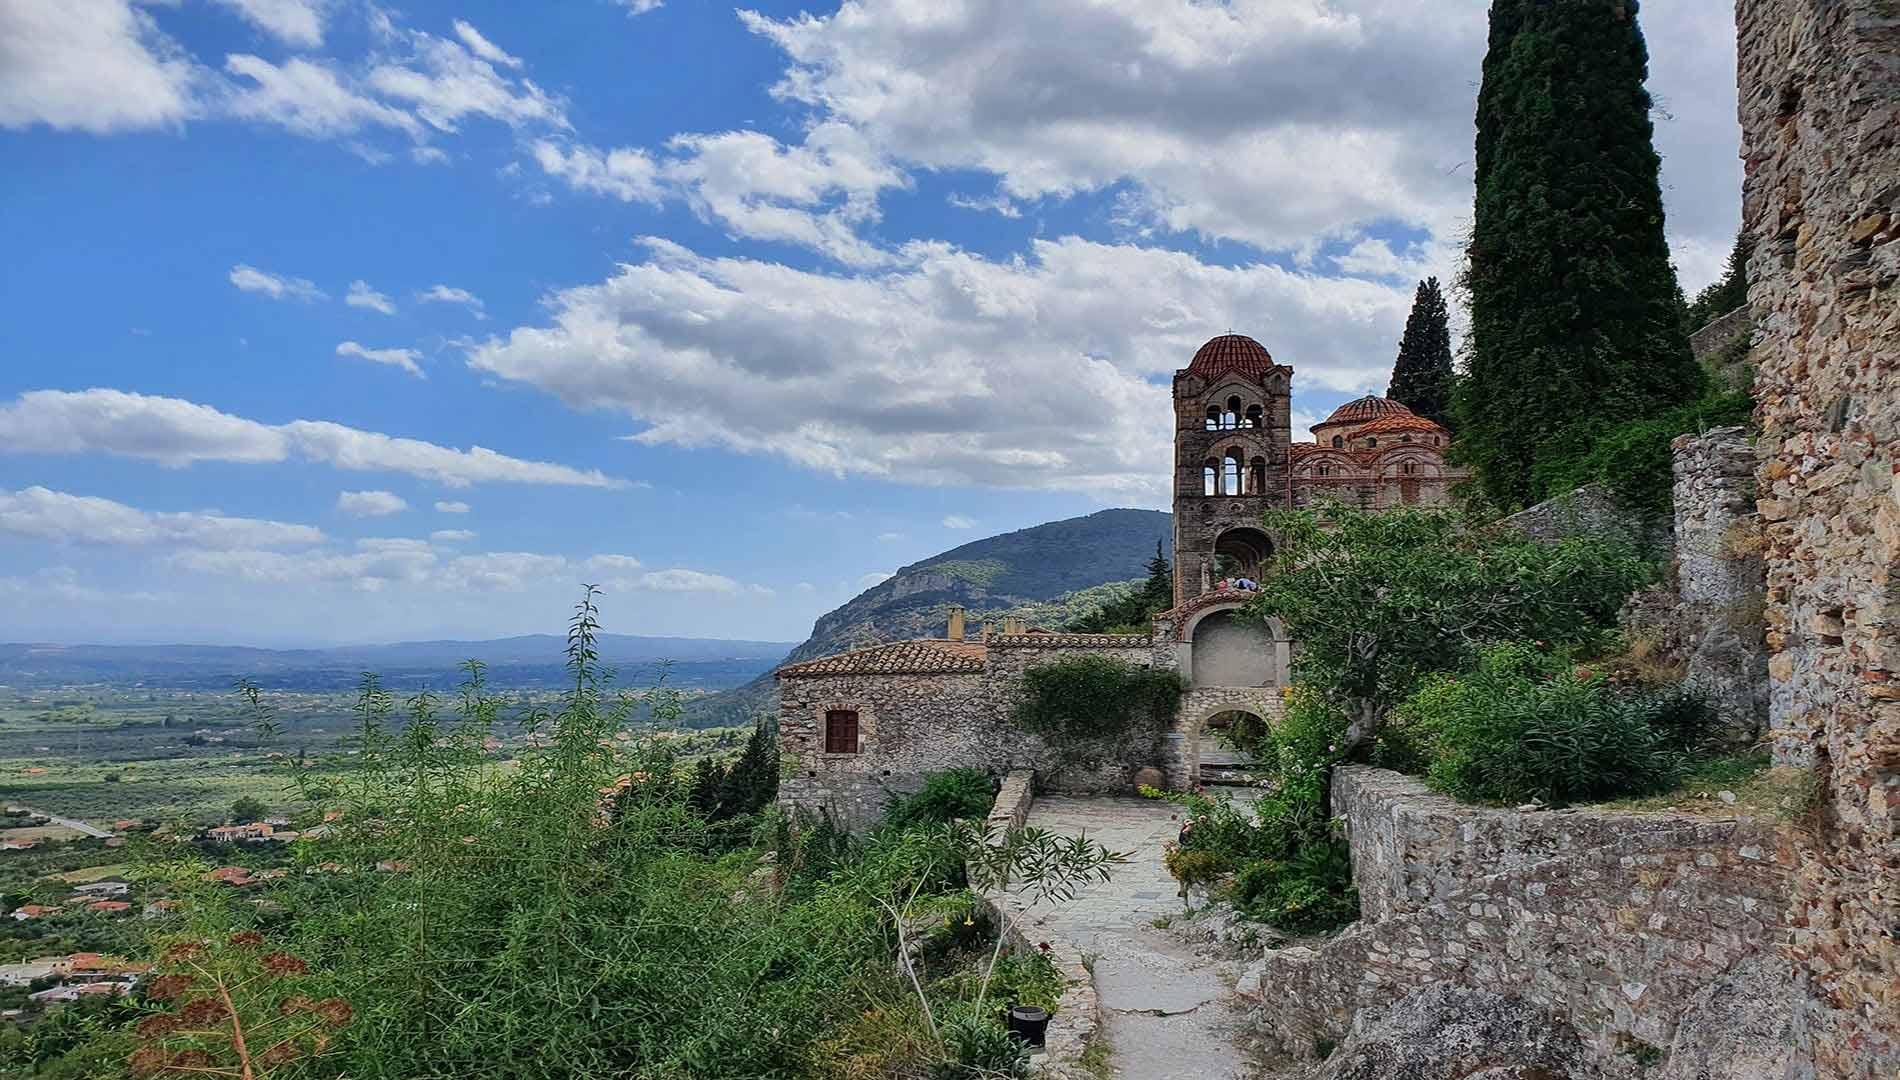 Day 9 : Kalamata - Taygetos mountain - Byzantine ruined city of Mystras - Museum of Olive Tree - Sparta -  Motorway -  Kalamata Km 170.